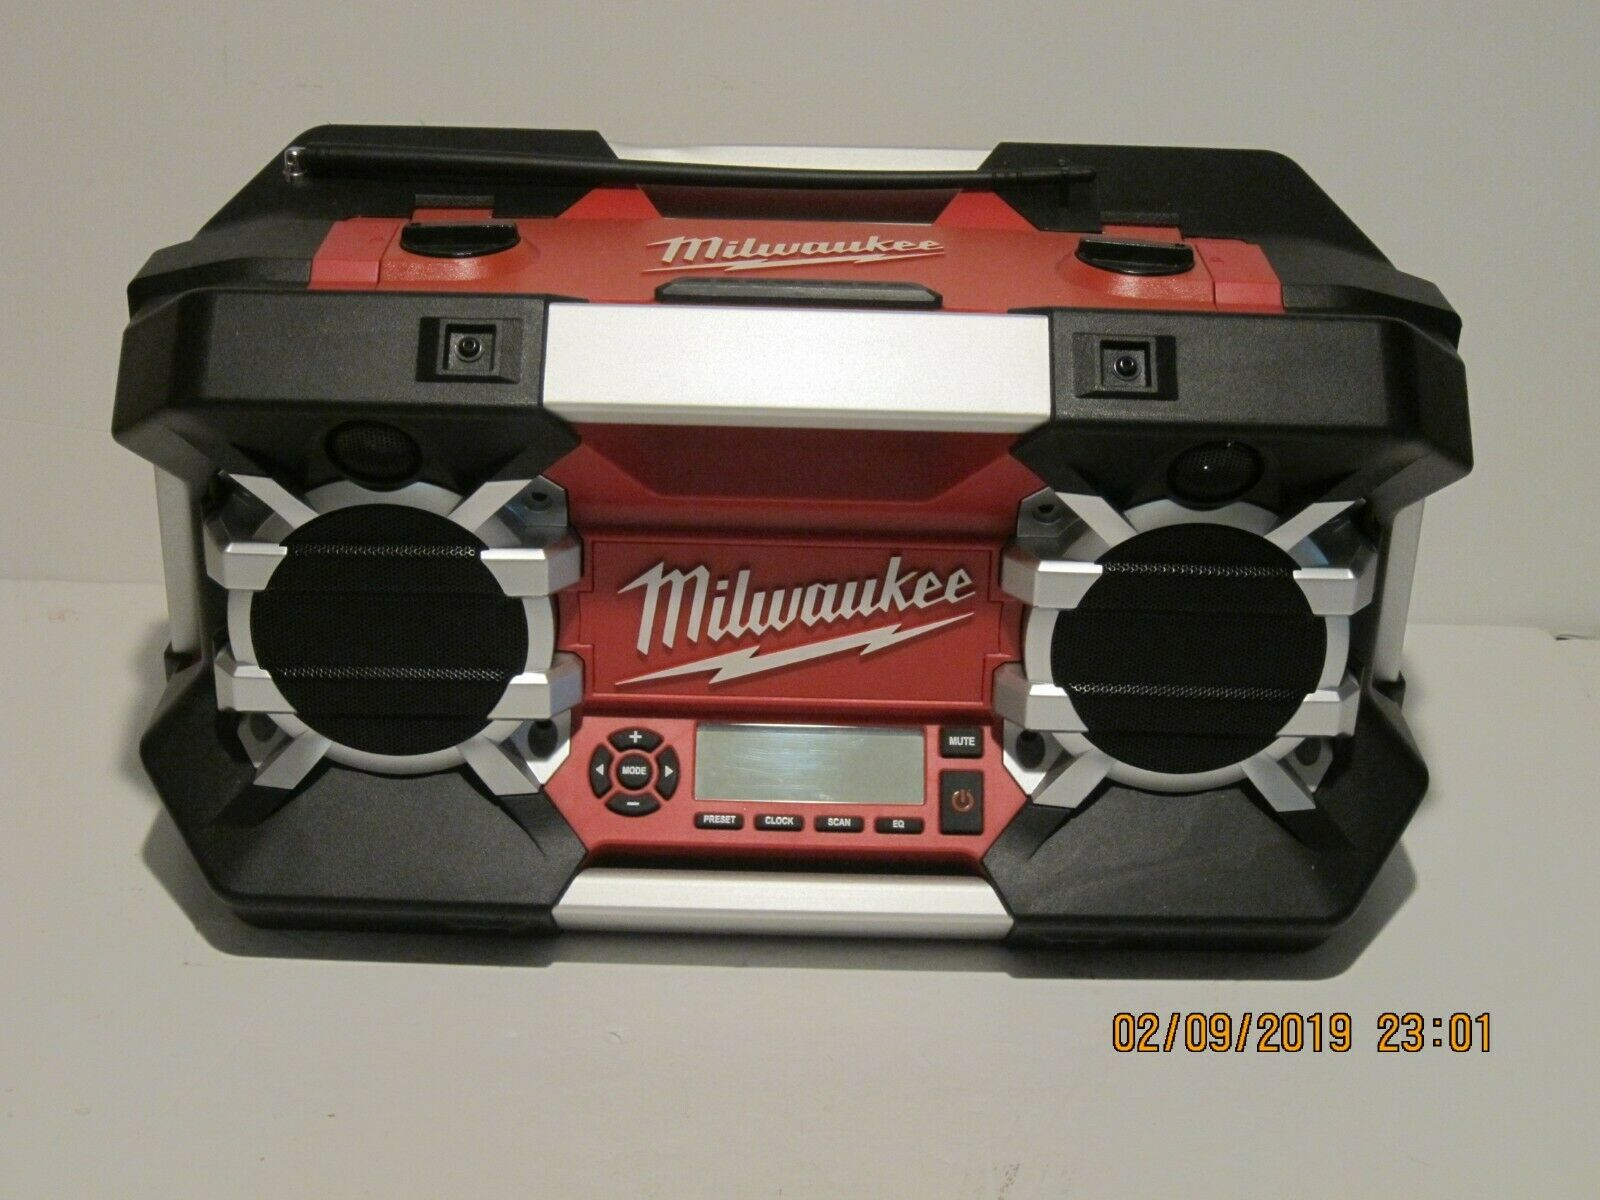 Milwaukee Radio 2790-20 12V-28Volt iPhone iPod Ready, FREE SHIP NEW DEMO DISPLAY